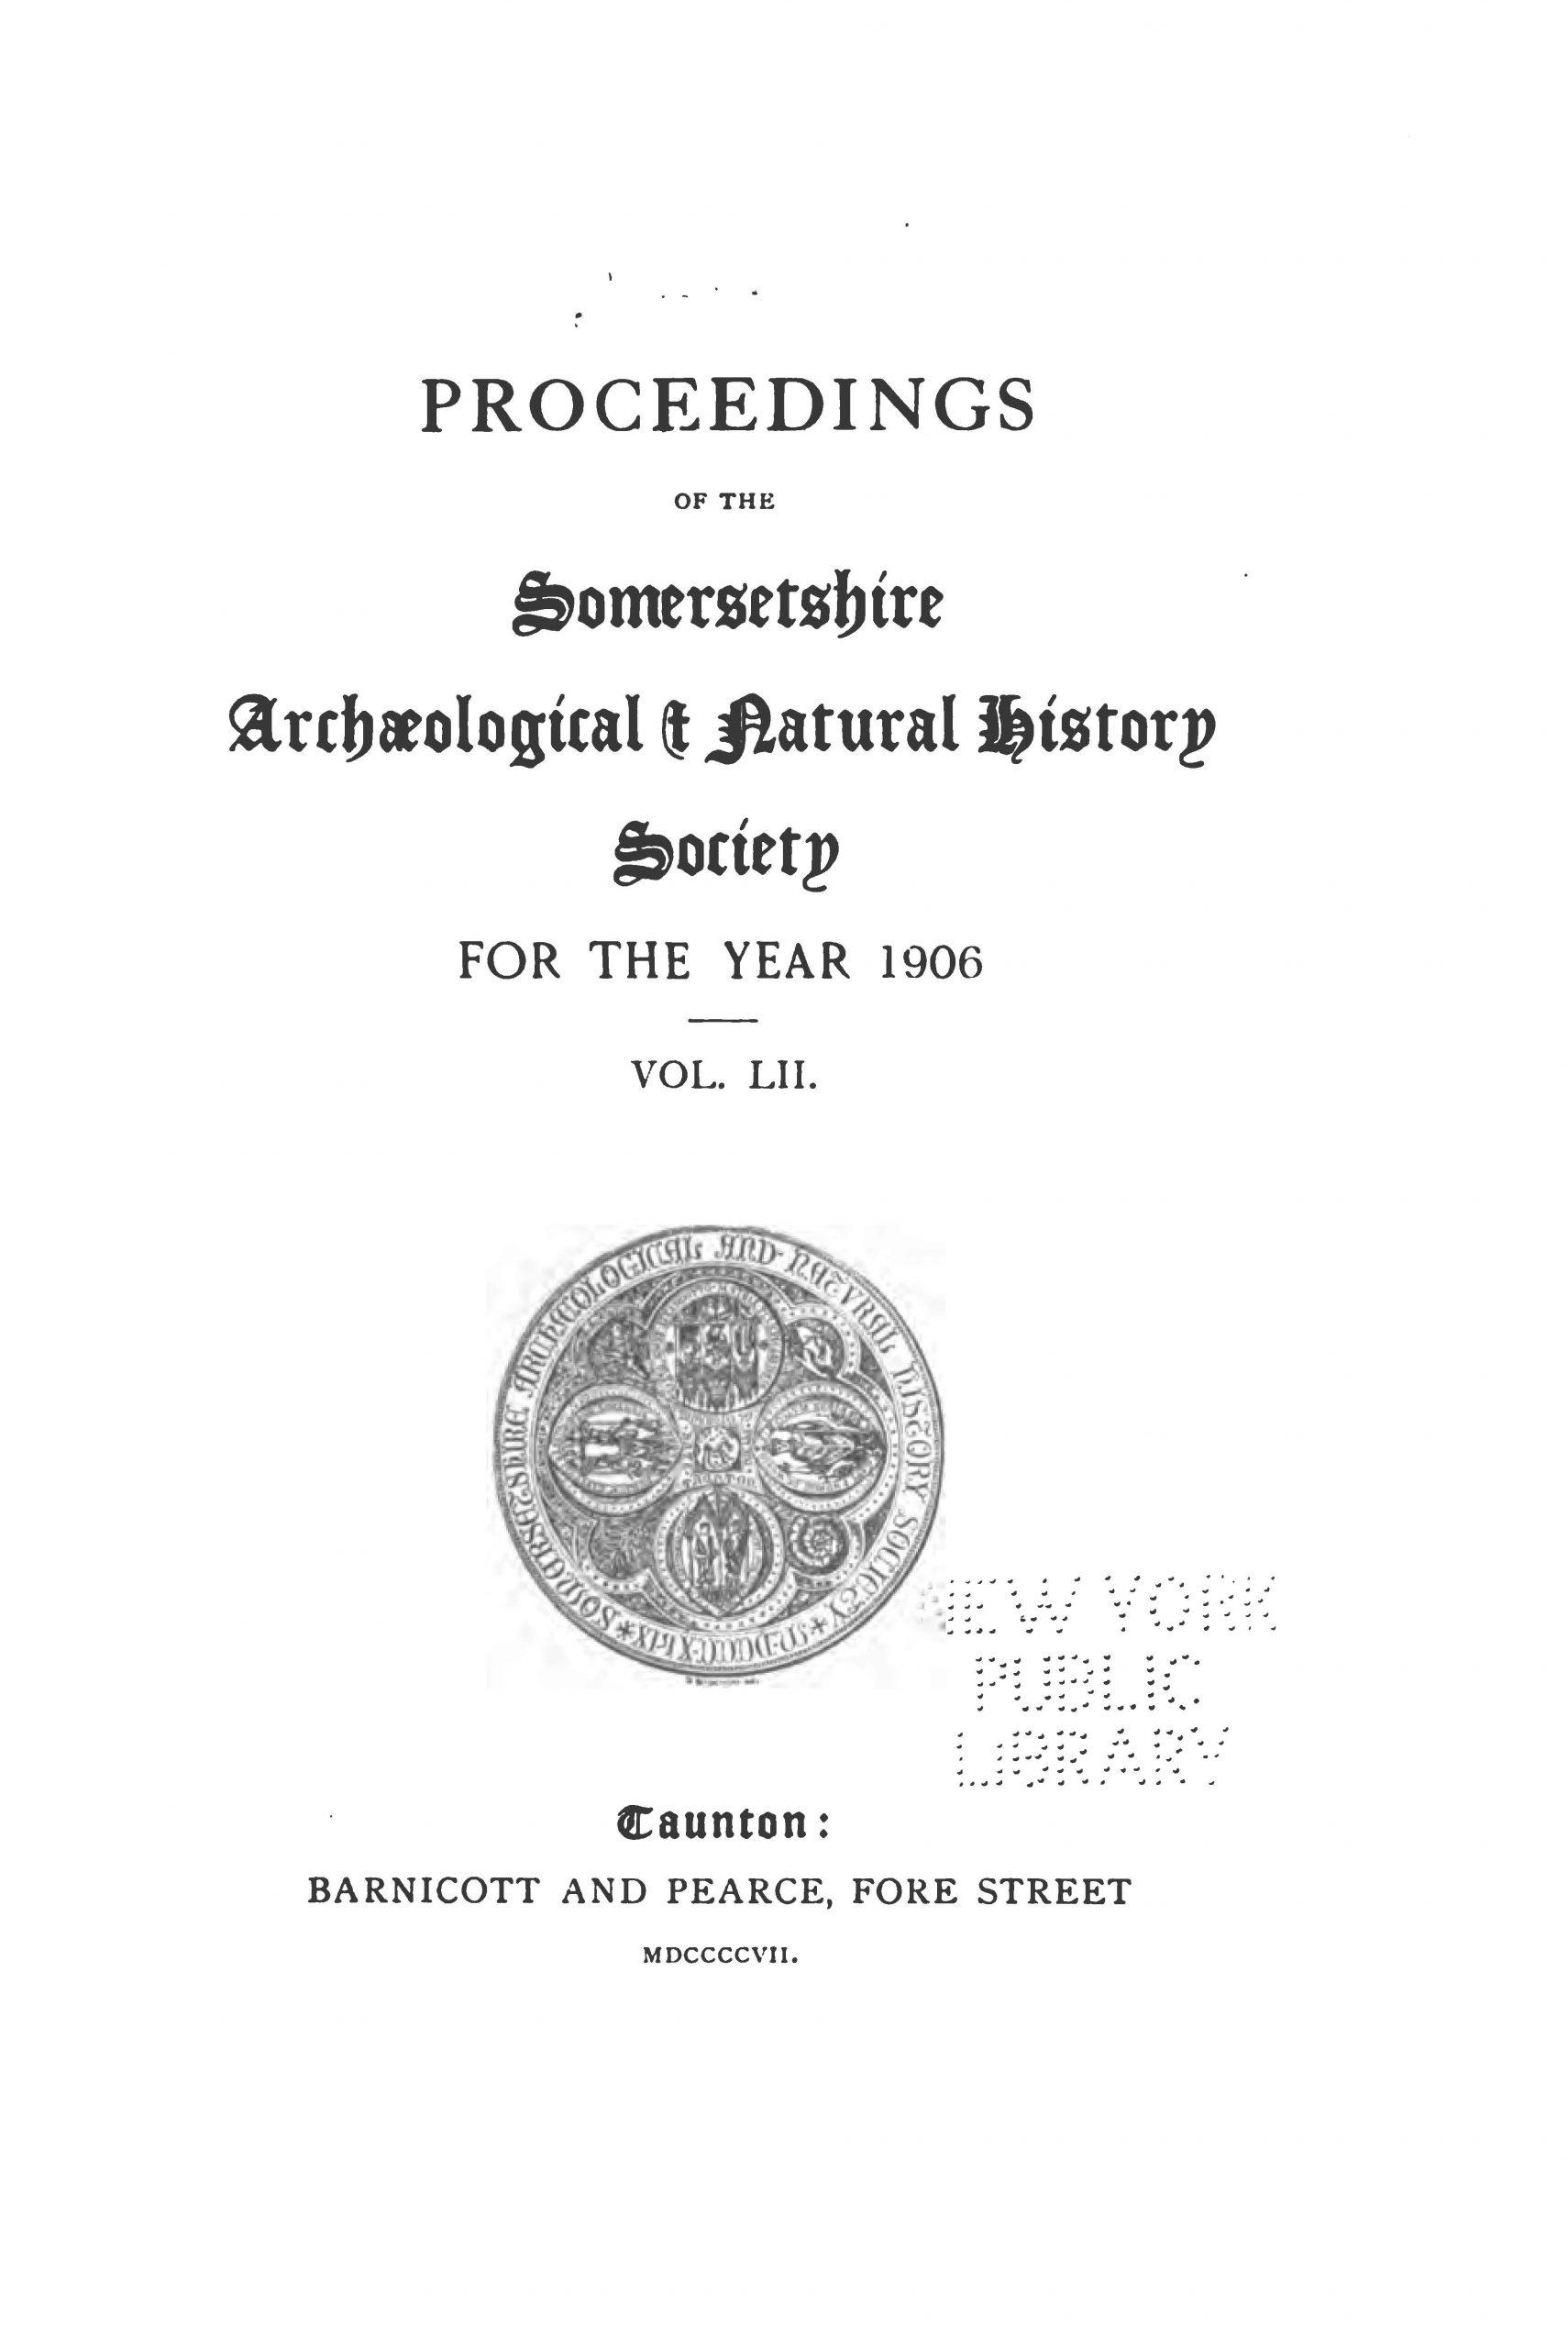 SANHS Proceedings Volume 52 cover